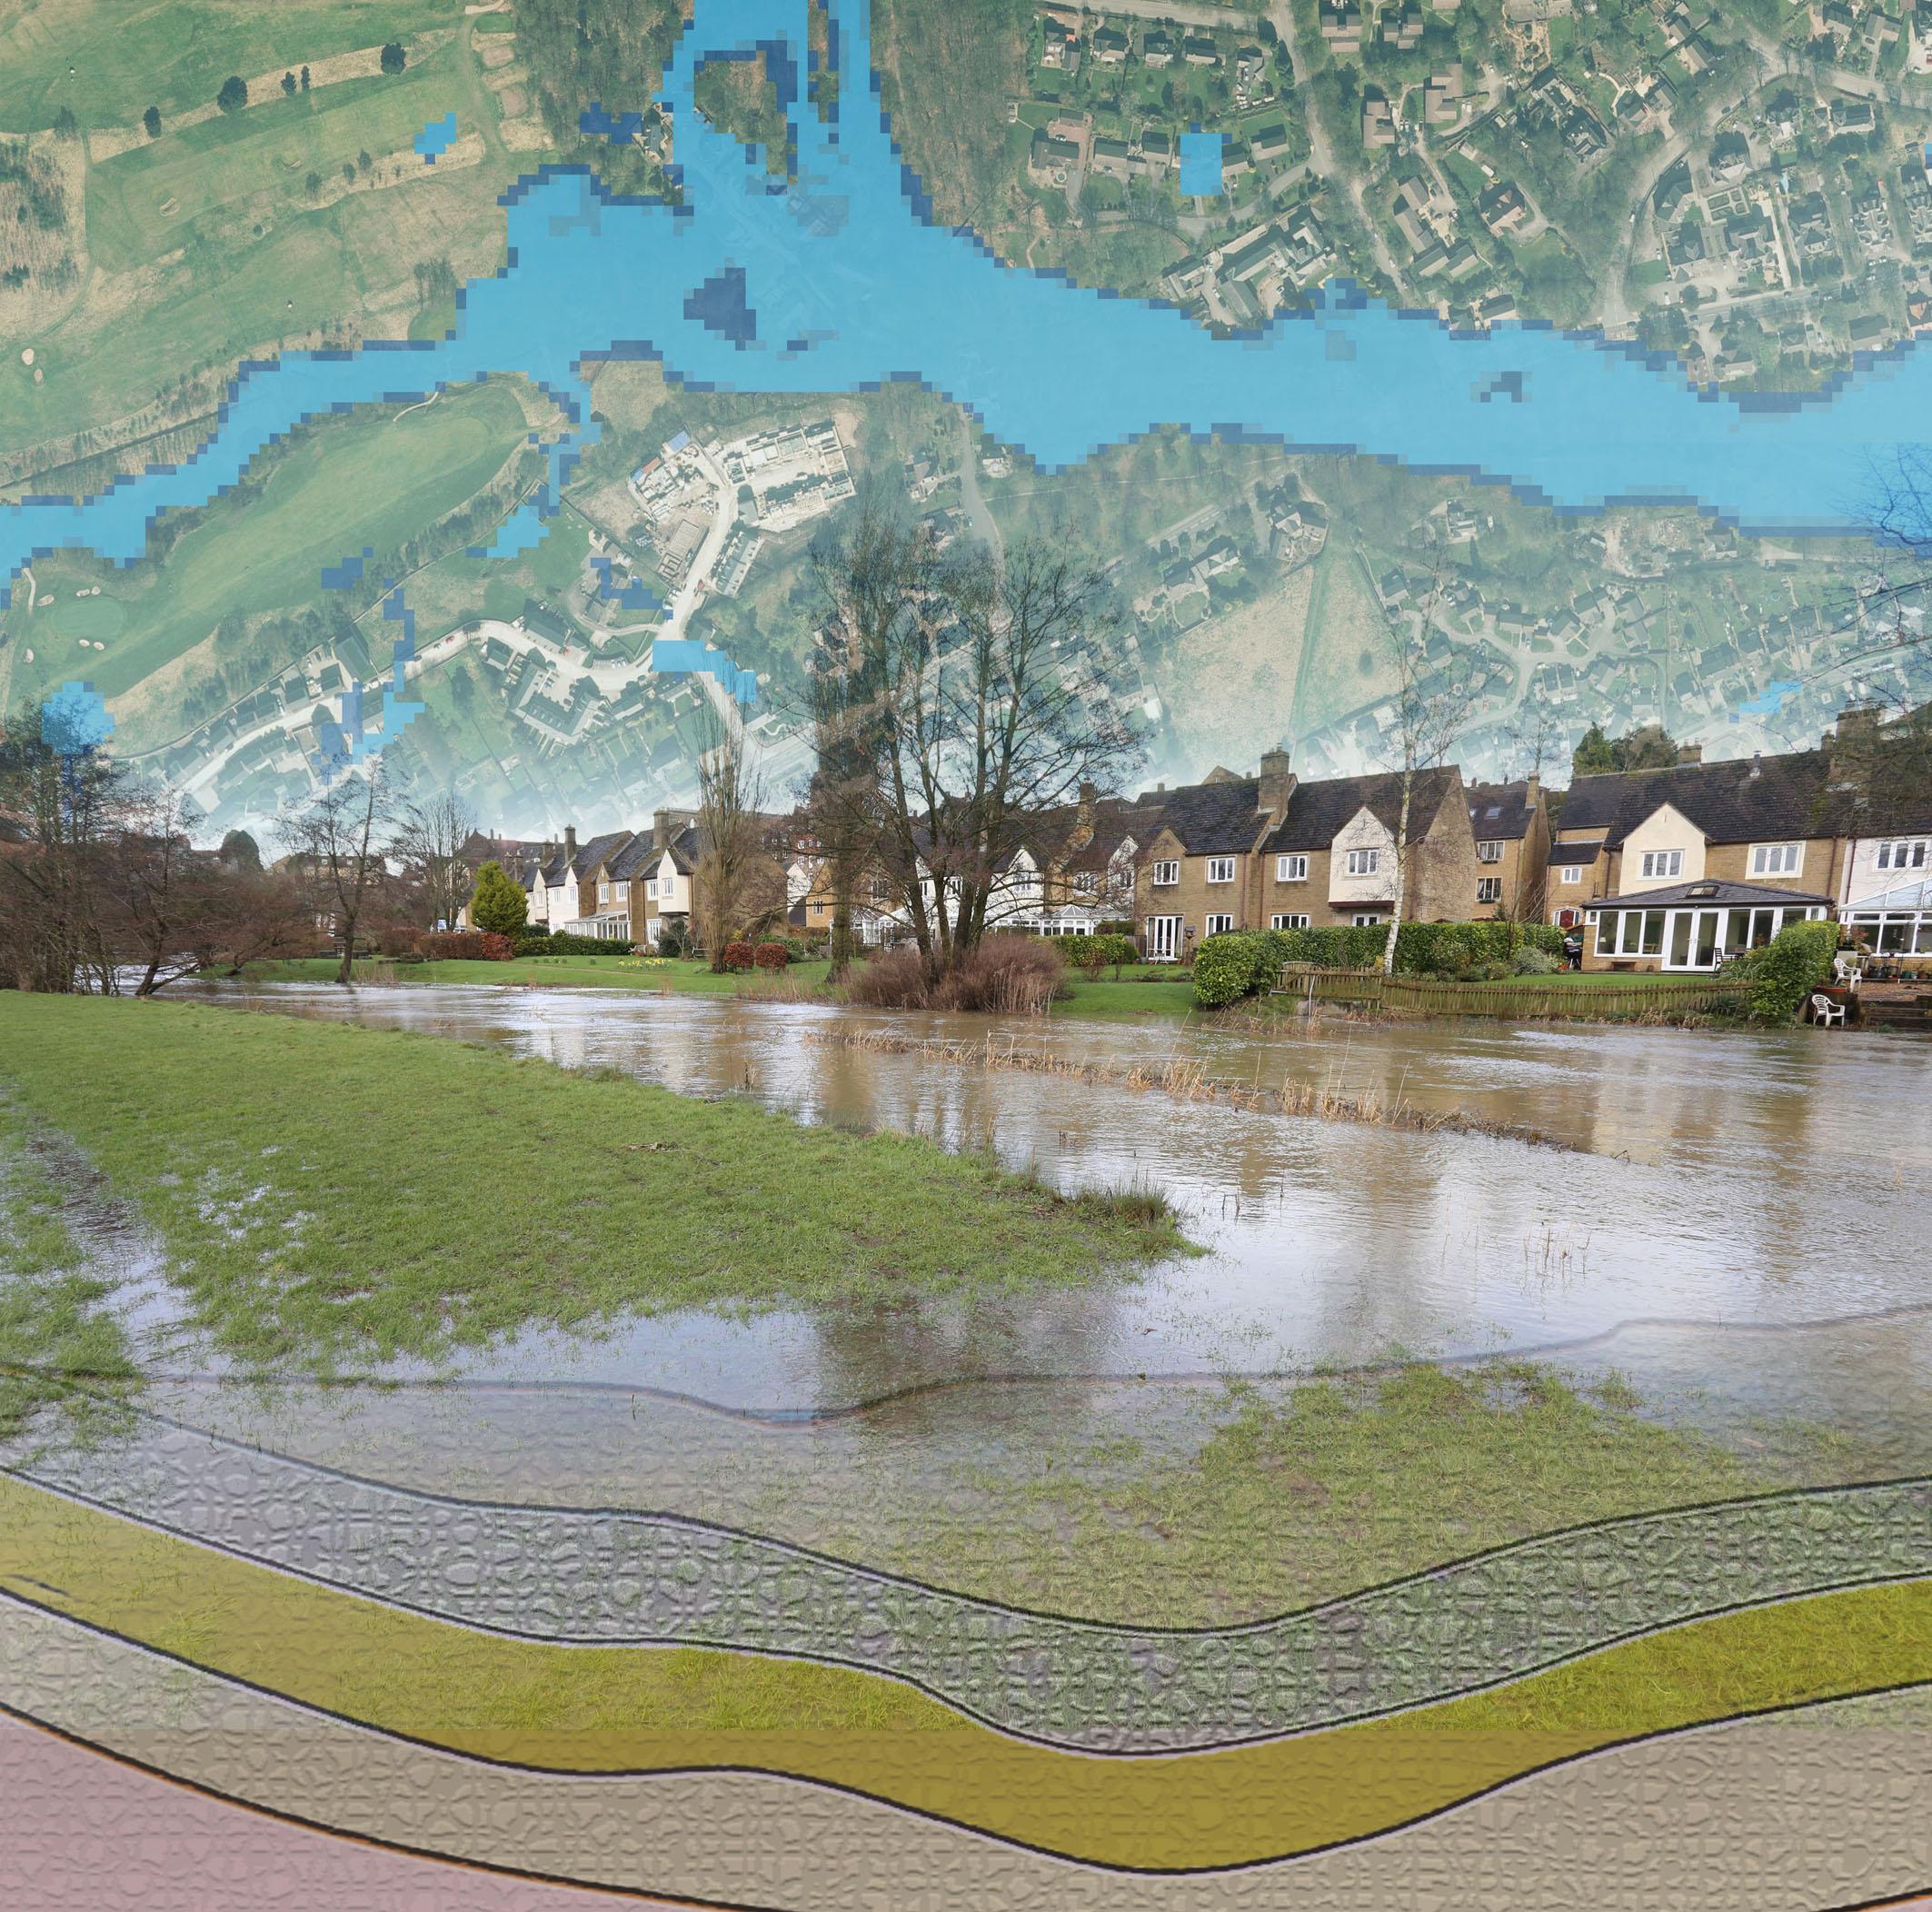 Bluesky Announces New Online Flood Risk Map of the UK on world flood map, china flood map, flood risk map, peru flood map, myanmar flood map, uk floods latest, va flood map, norway flood map, mn flood map, cs flood map, al flood map, usa flood map, nc flood map, sc flood map, ky flood map, dc flood map, flood warning map, tx flood map, california flood map, cuba flood map,